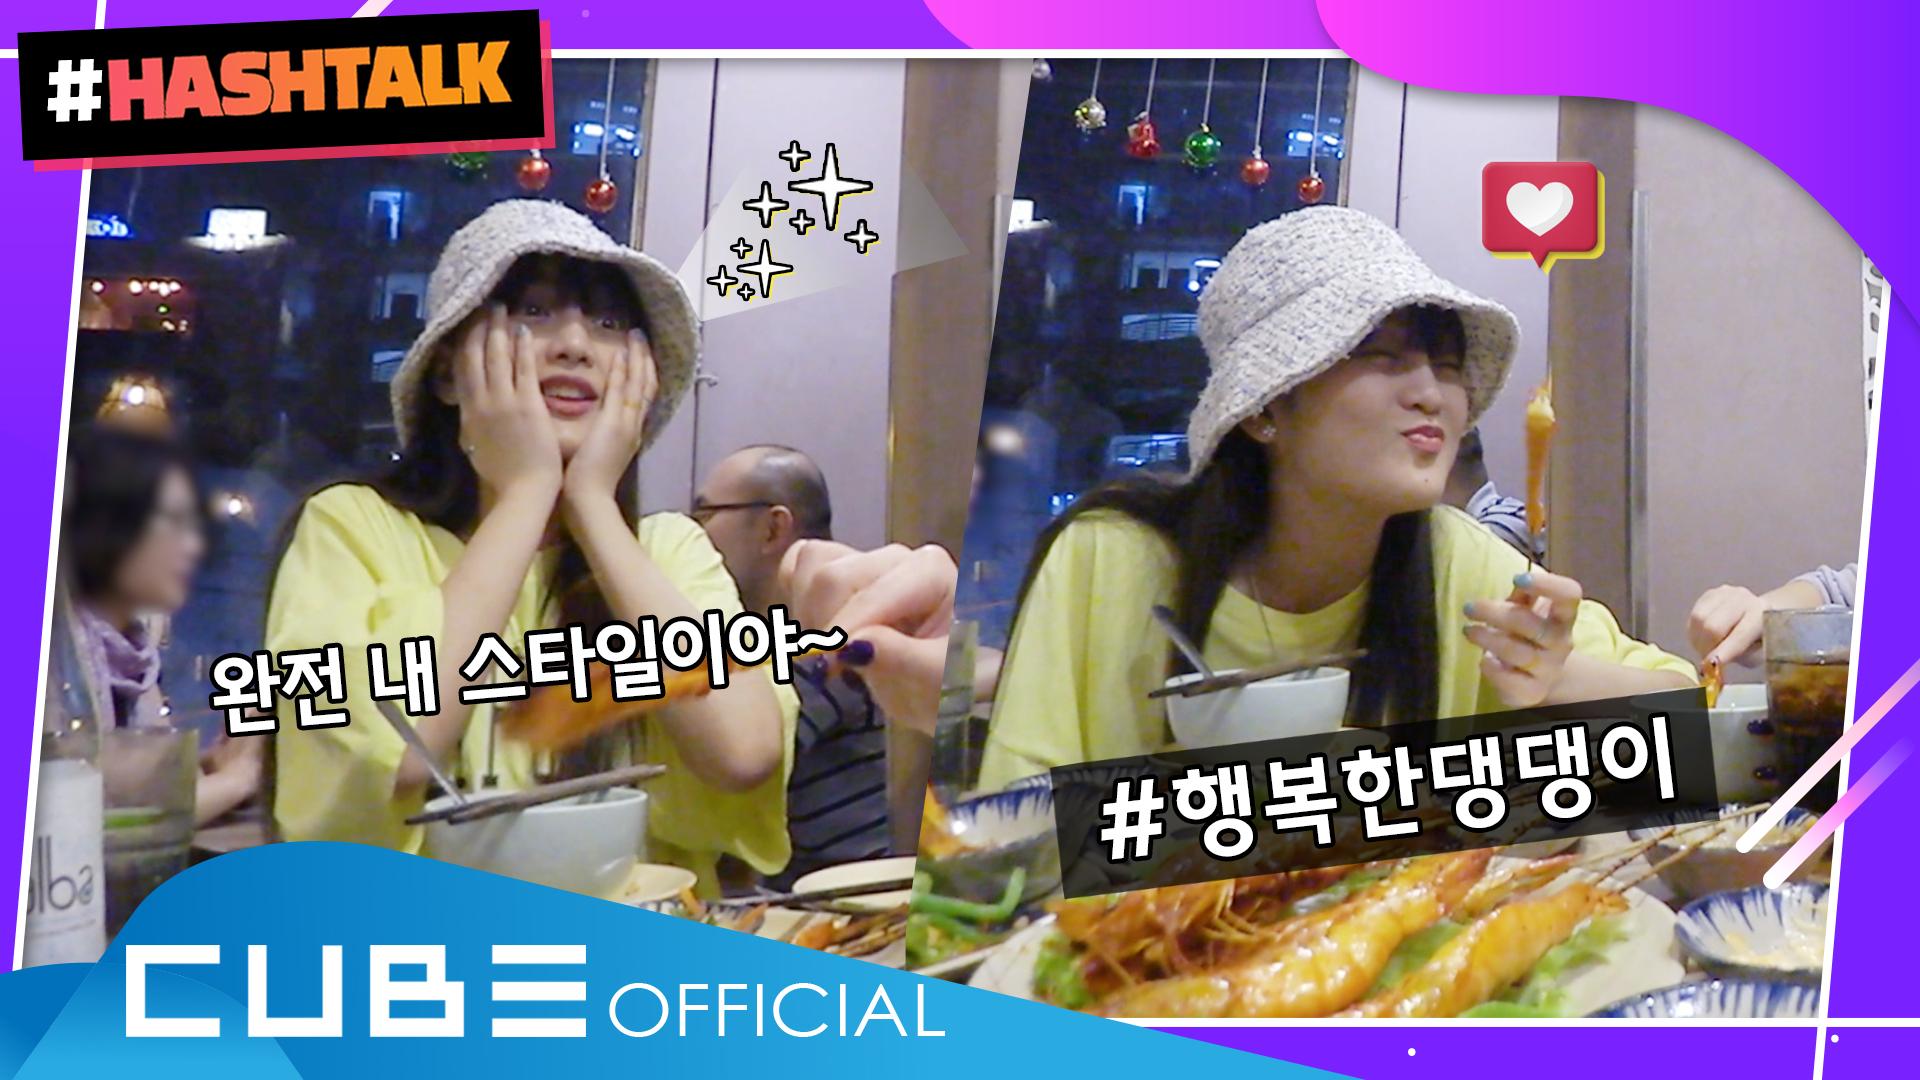 [#HASHTALK] EP.3 리액션 장인 욘따라락의 행복적 모먼트ㅣ(여자)아이들 ((G)I-DLE)